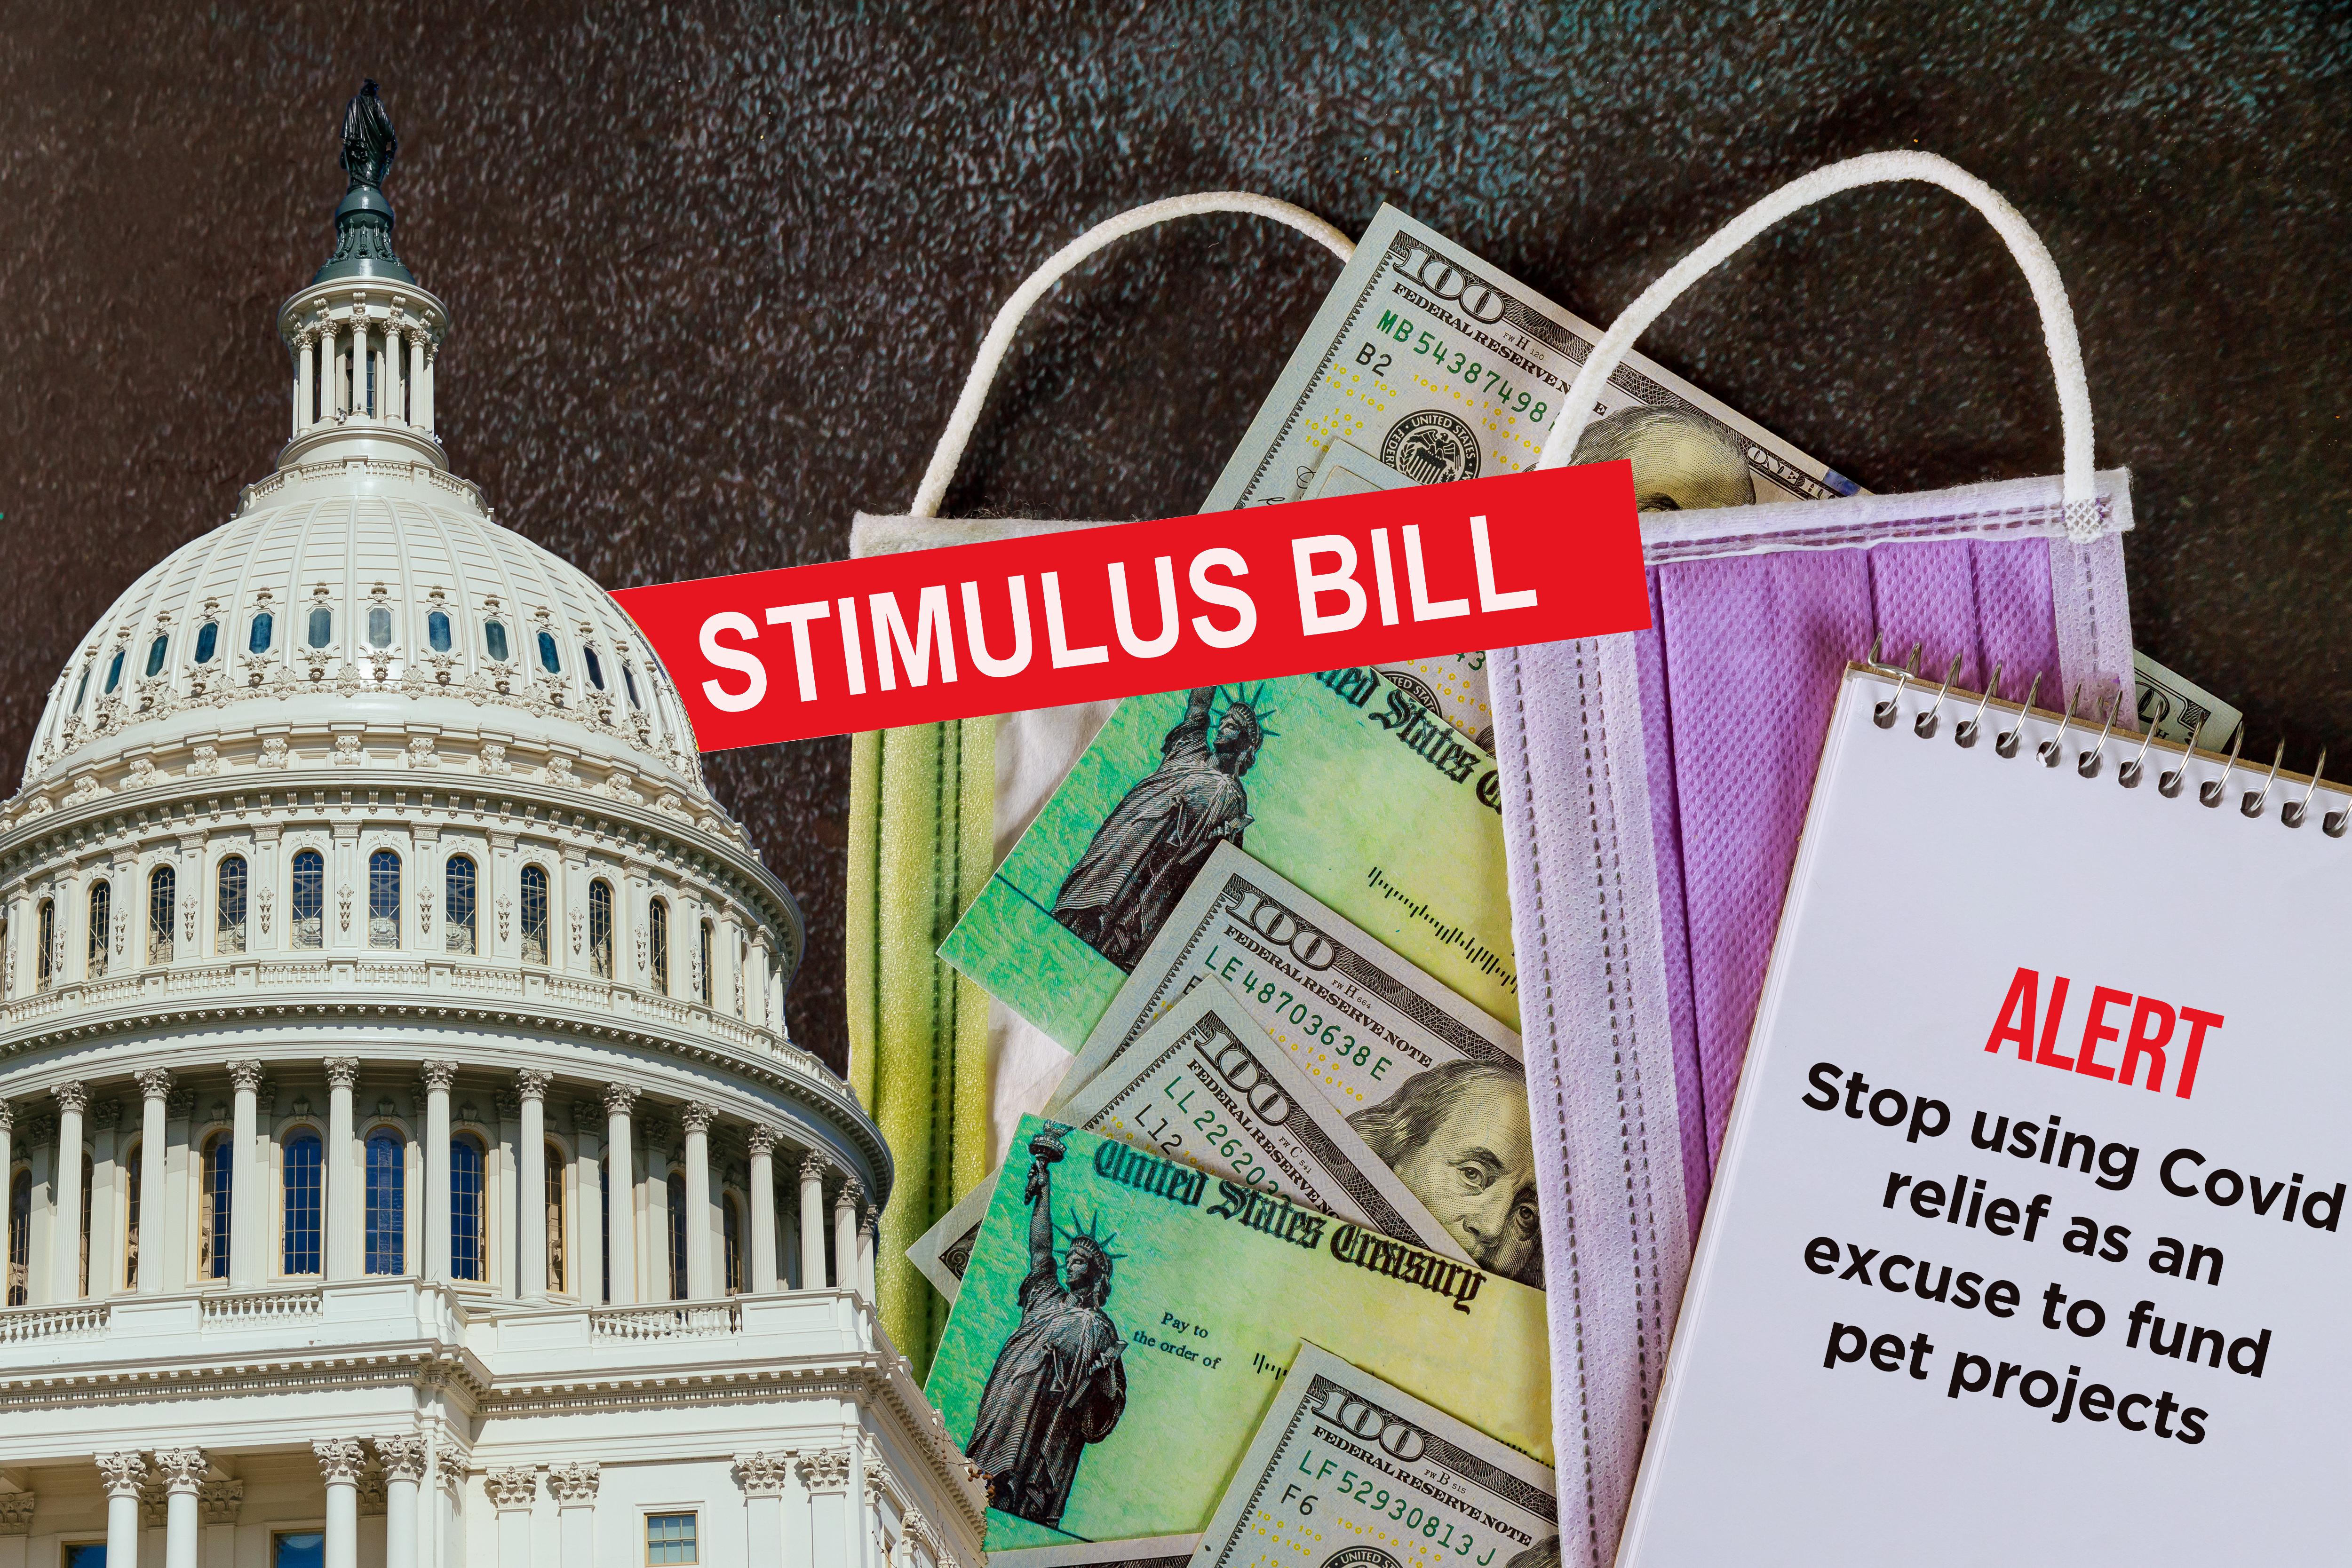 Stop the Stimulus Scam